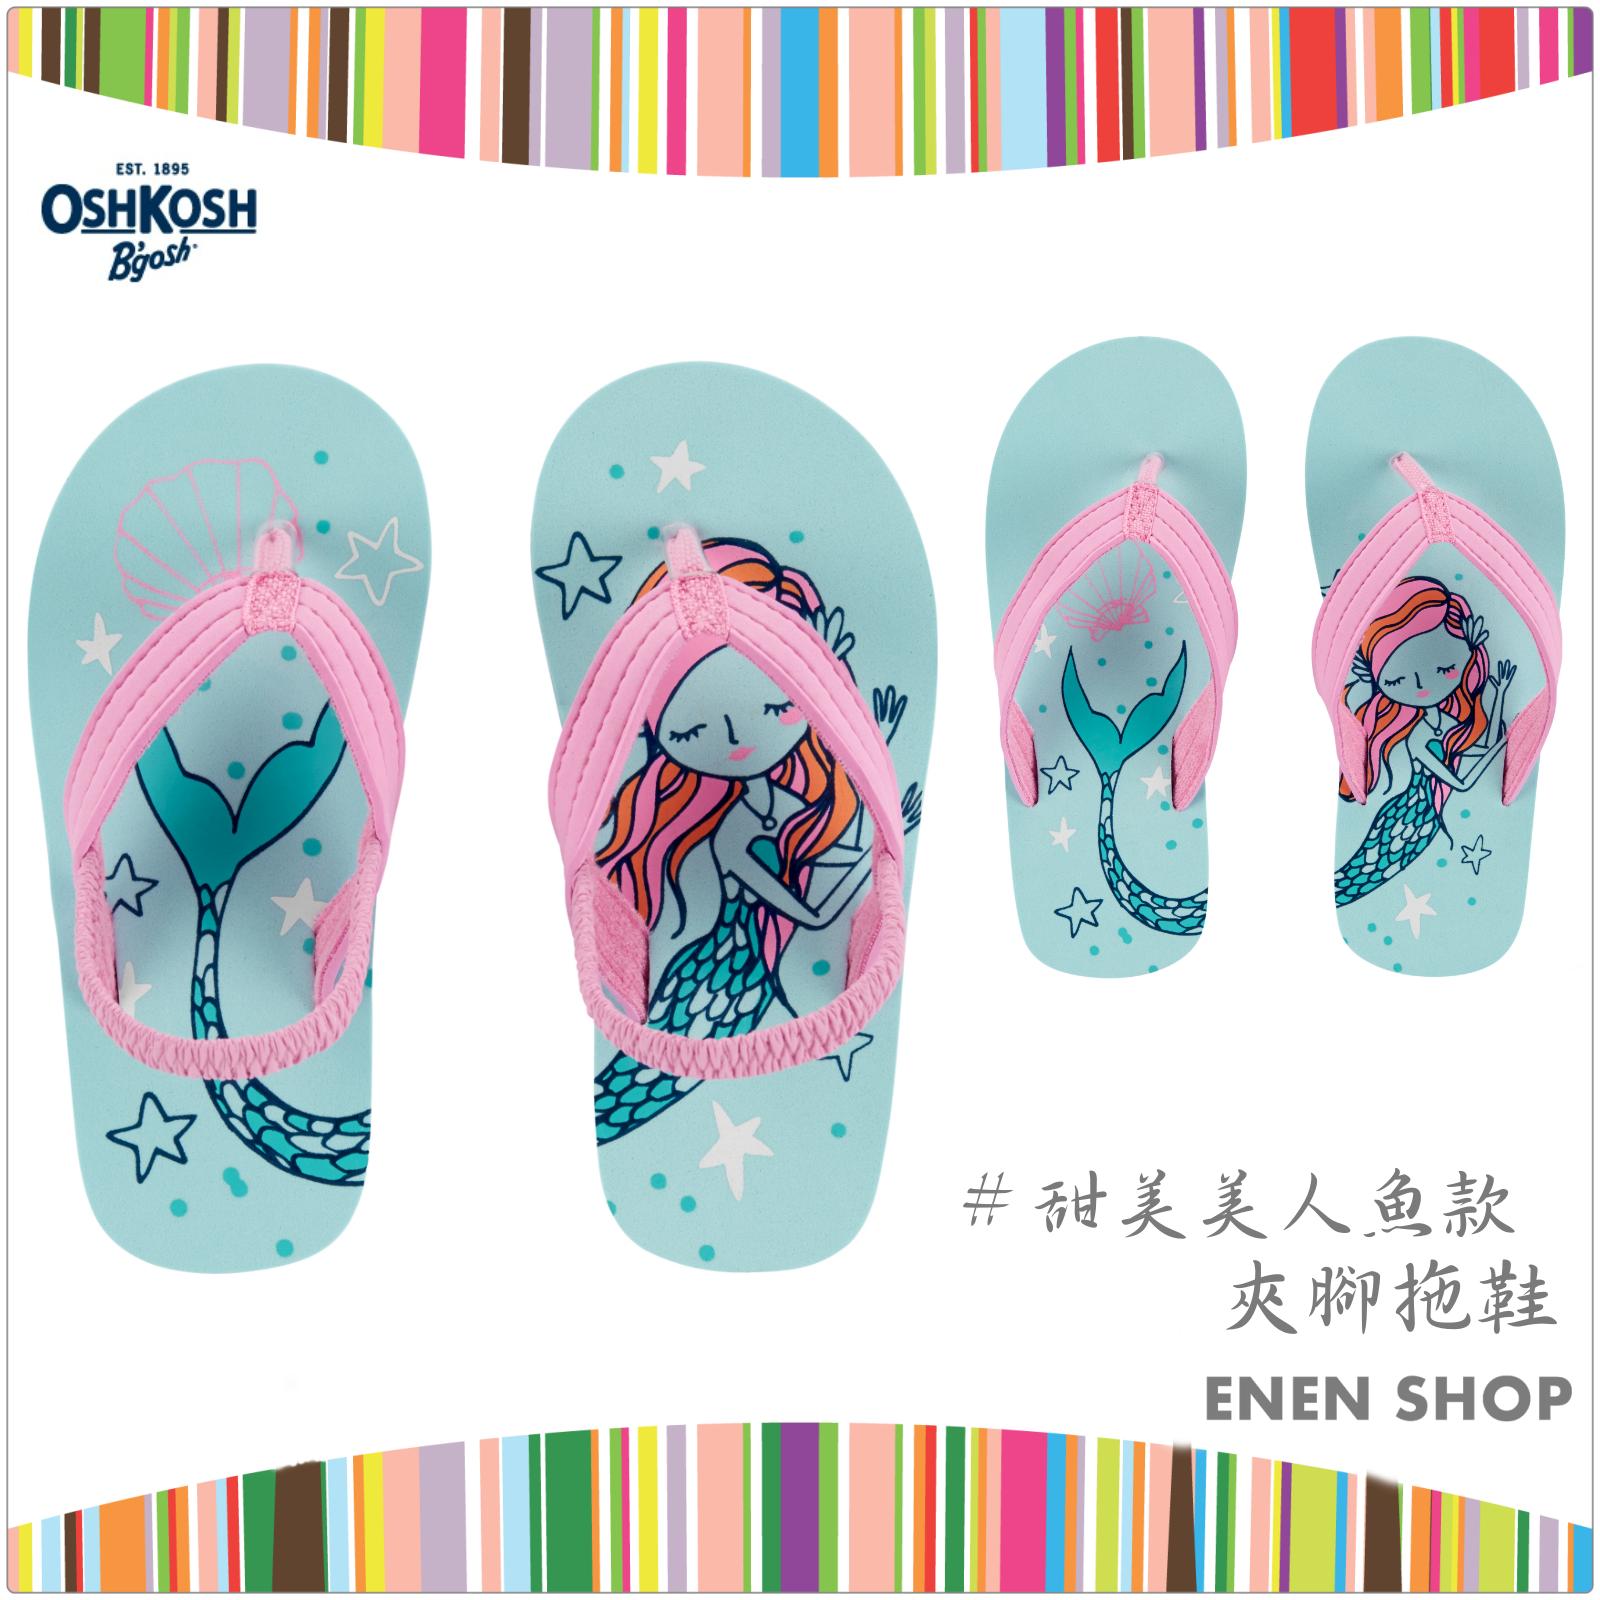 『Enen Shop』@OshKosh 甜美美人魚款夾腳拖鞋/人字拖/海灘鞋#OS20U11H|S/M/L/XL/XXL